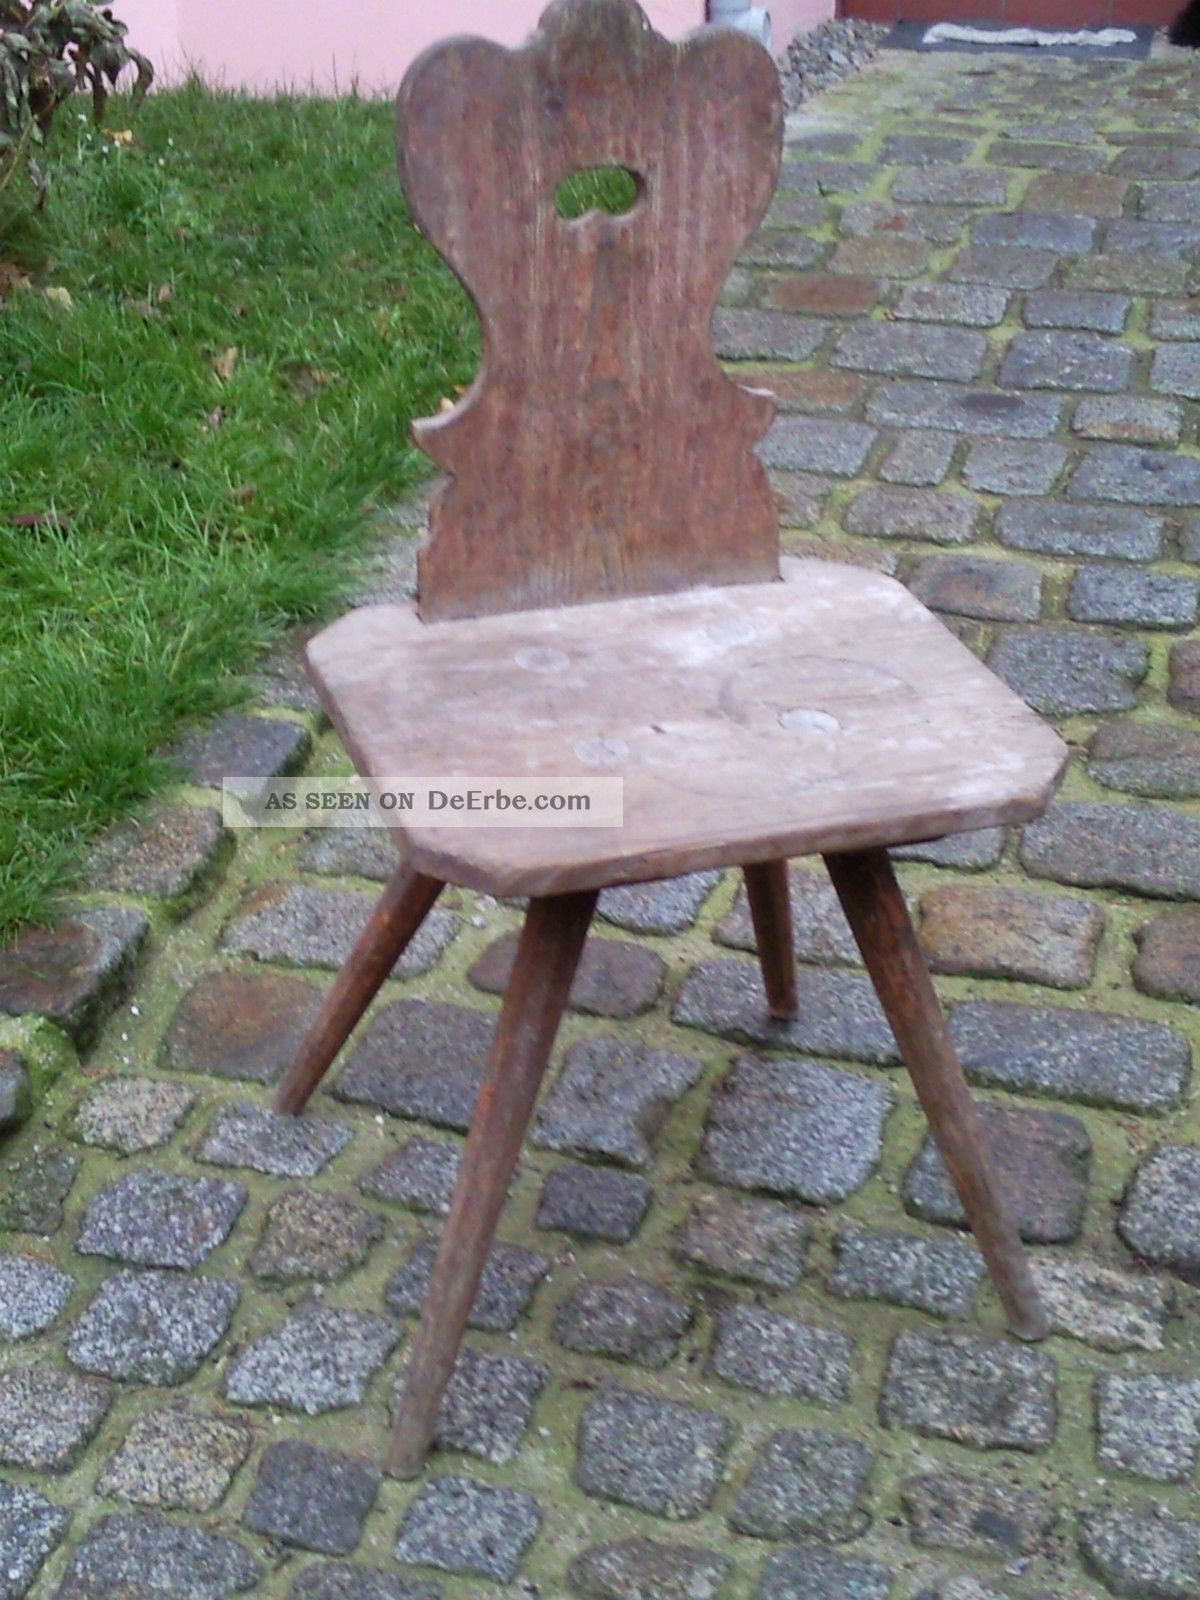 sehr alter bauernstuhl stuhl aus weichholz holz holzstuhl landhaus. Black Bedroom Furniture Sets. Home Design Ideas